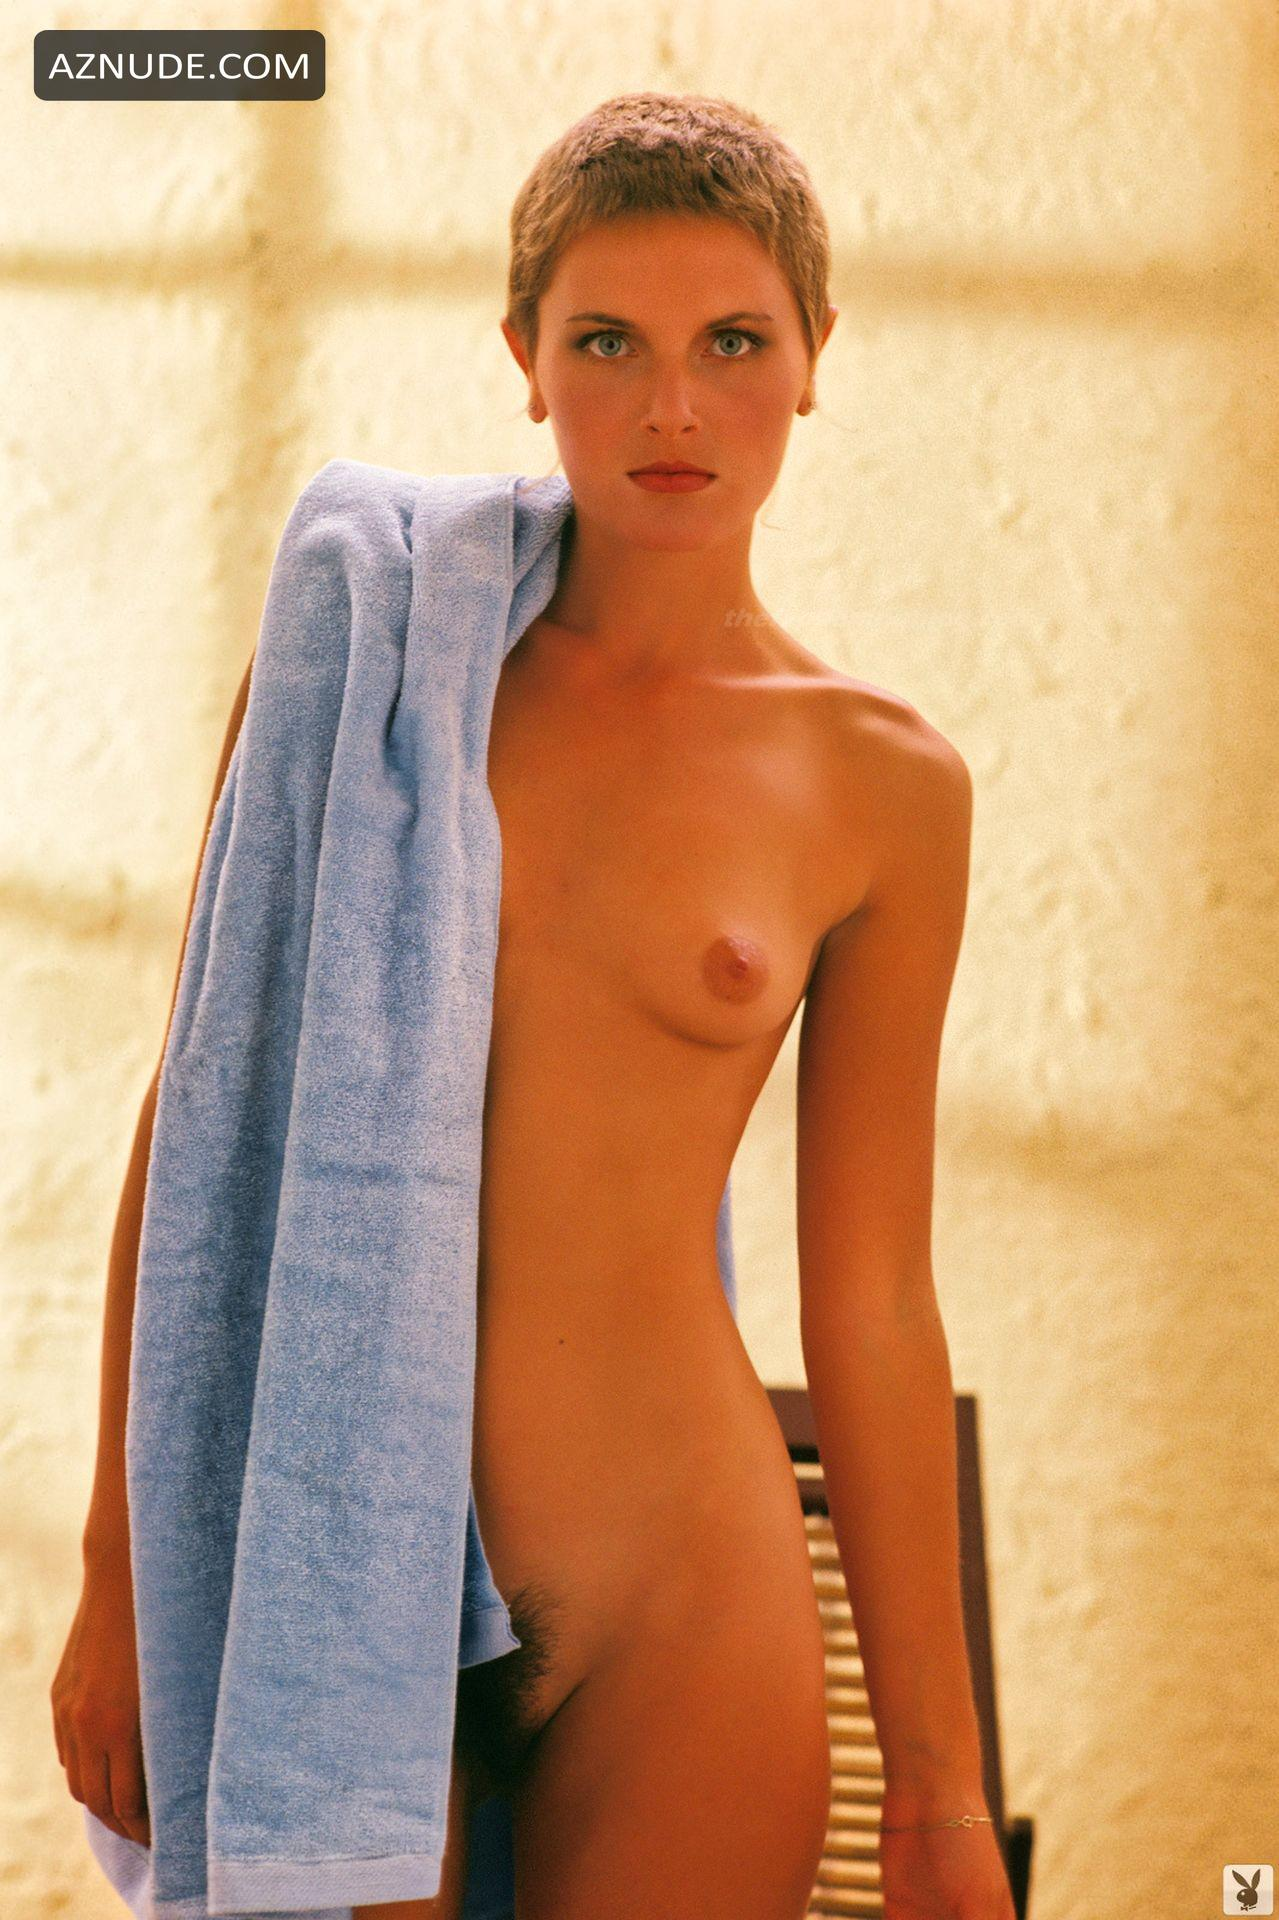 Naked denise crosby Denise Crosby